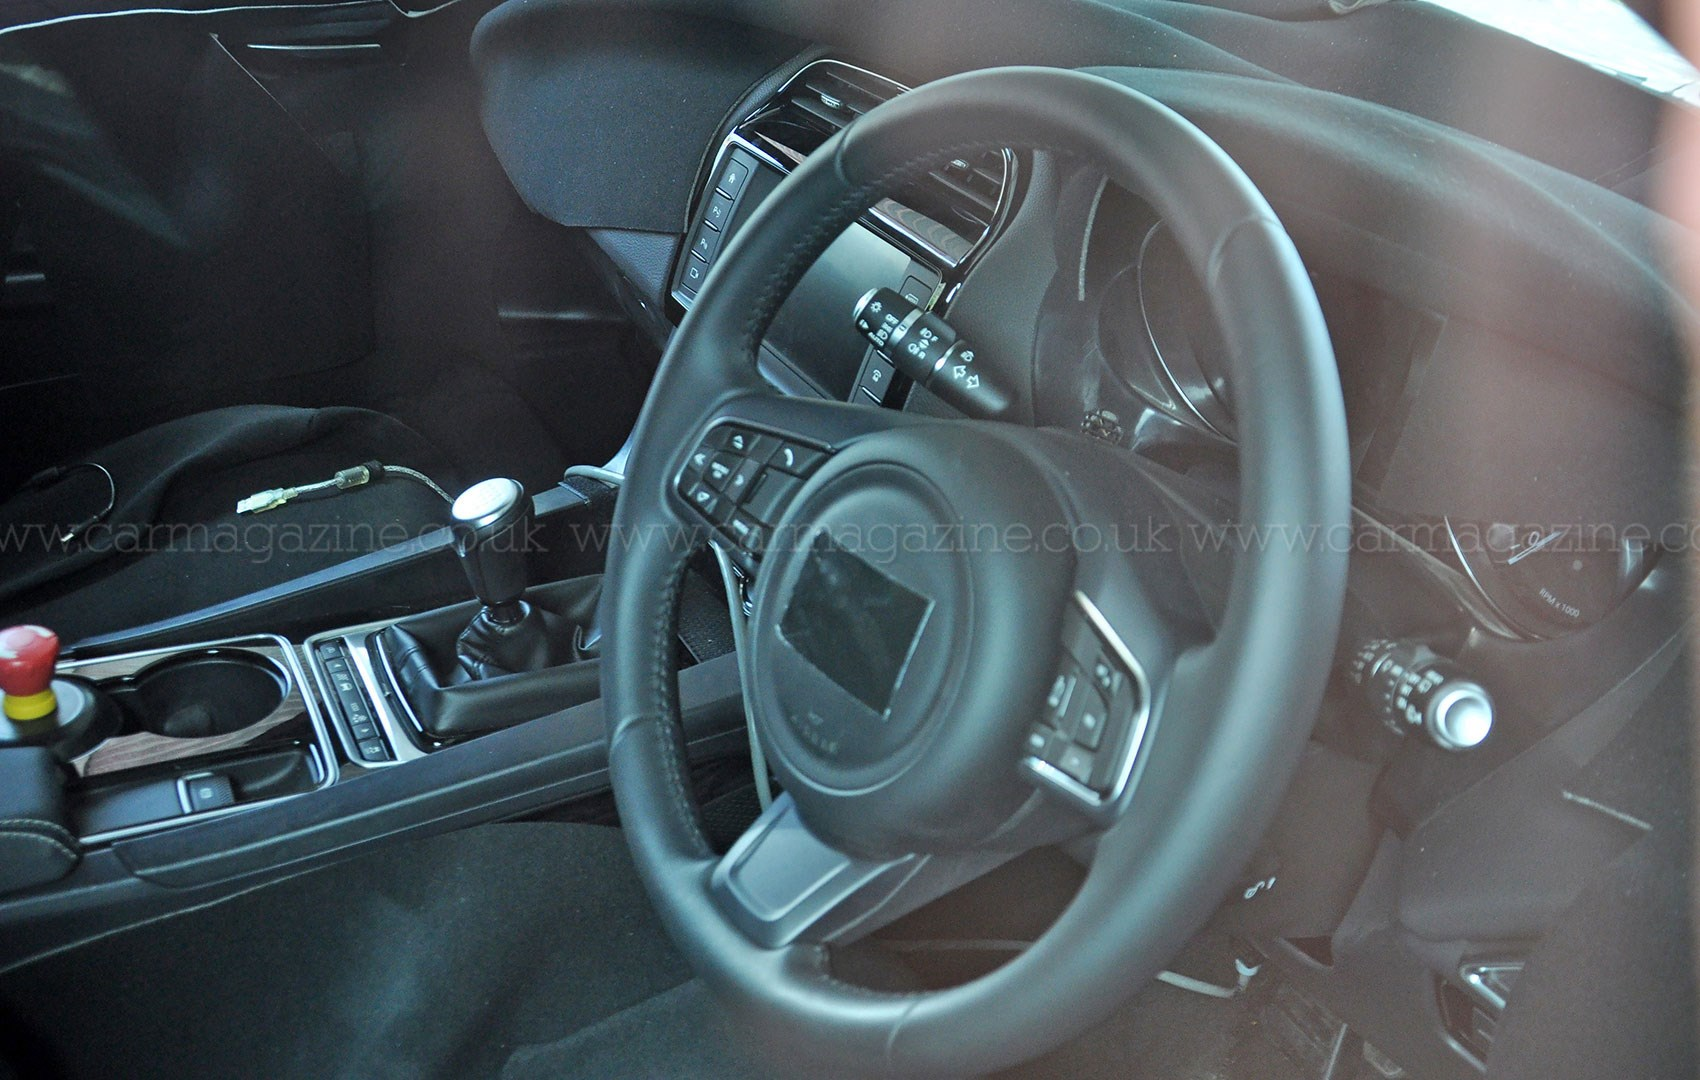 Jaguar F-Pace interior spyshots: a peek inside new Jag SUV | CAR ...